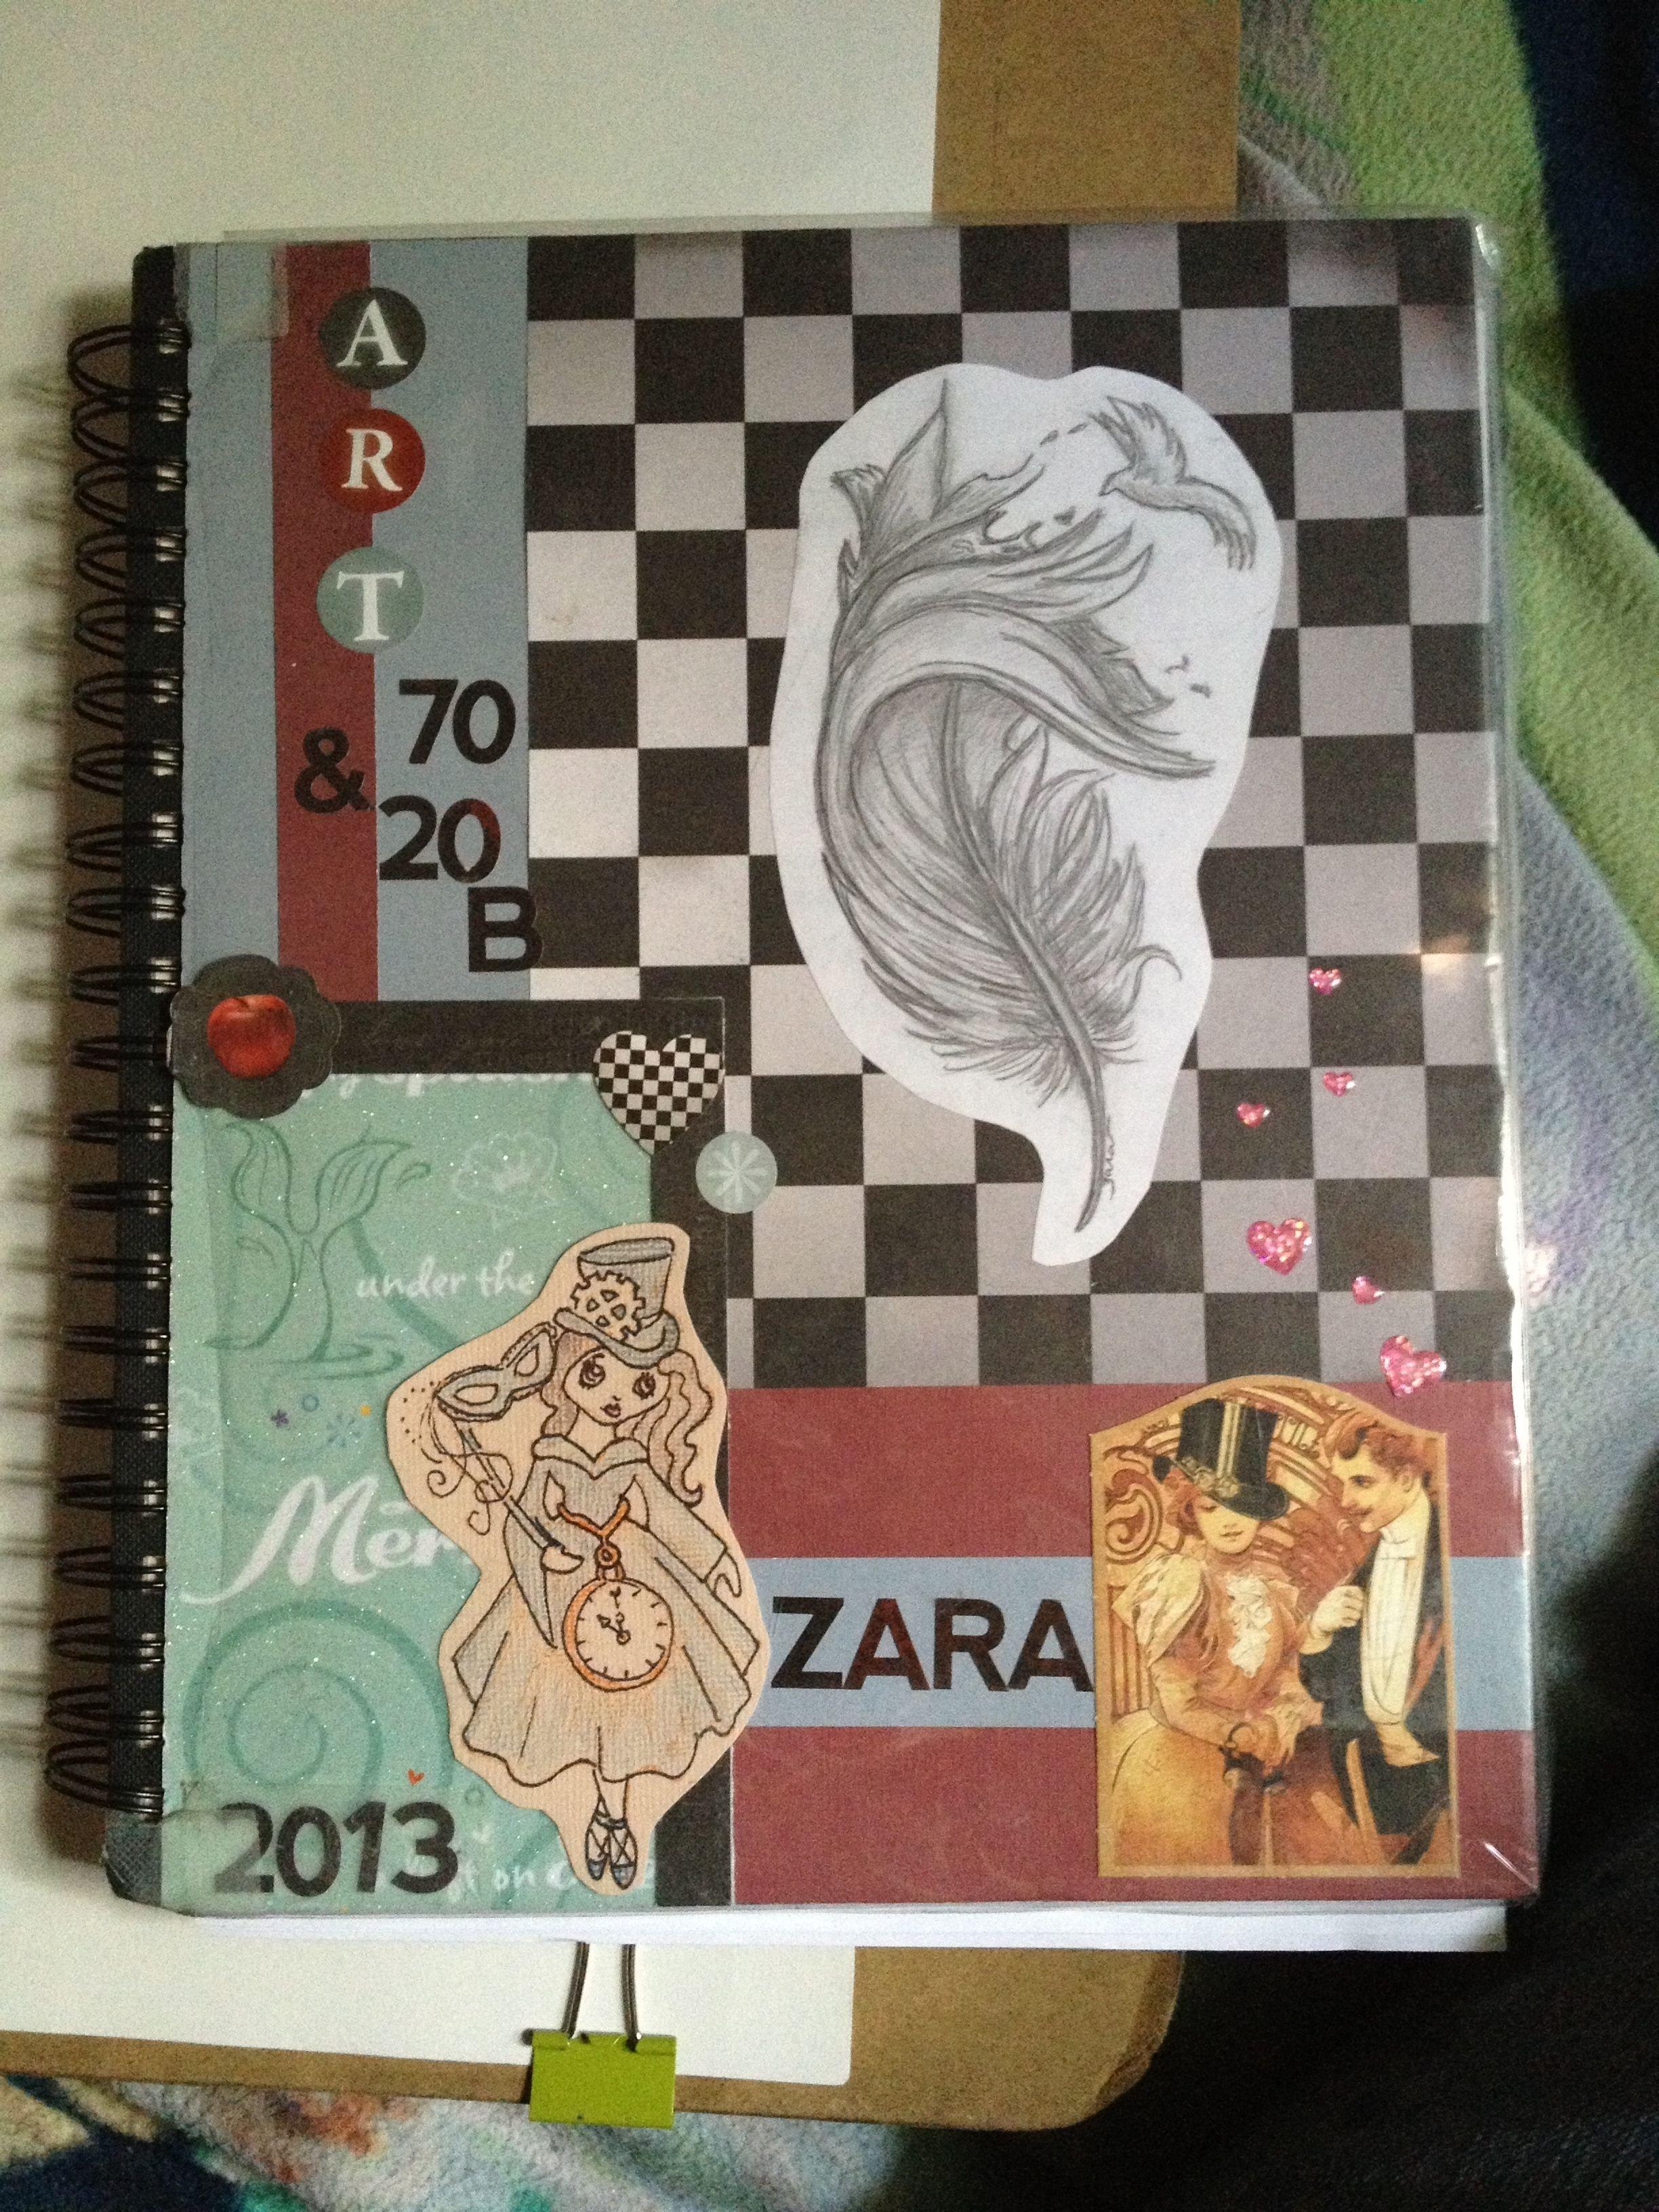 10 Stunning Sketchbook Ideas For Middle School sketchbook cover my art and cat pinterest sketchbook cover 2020